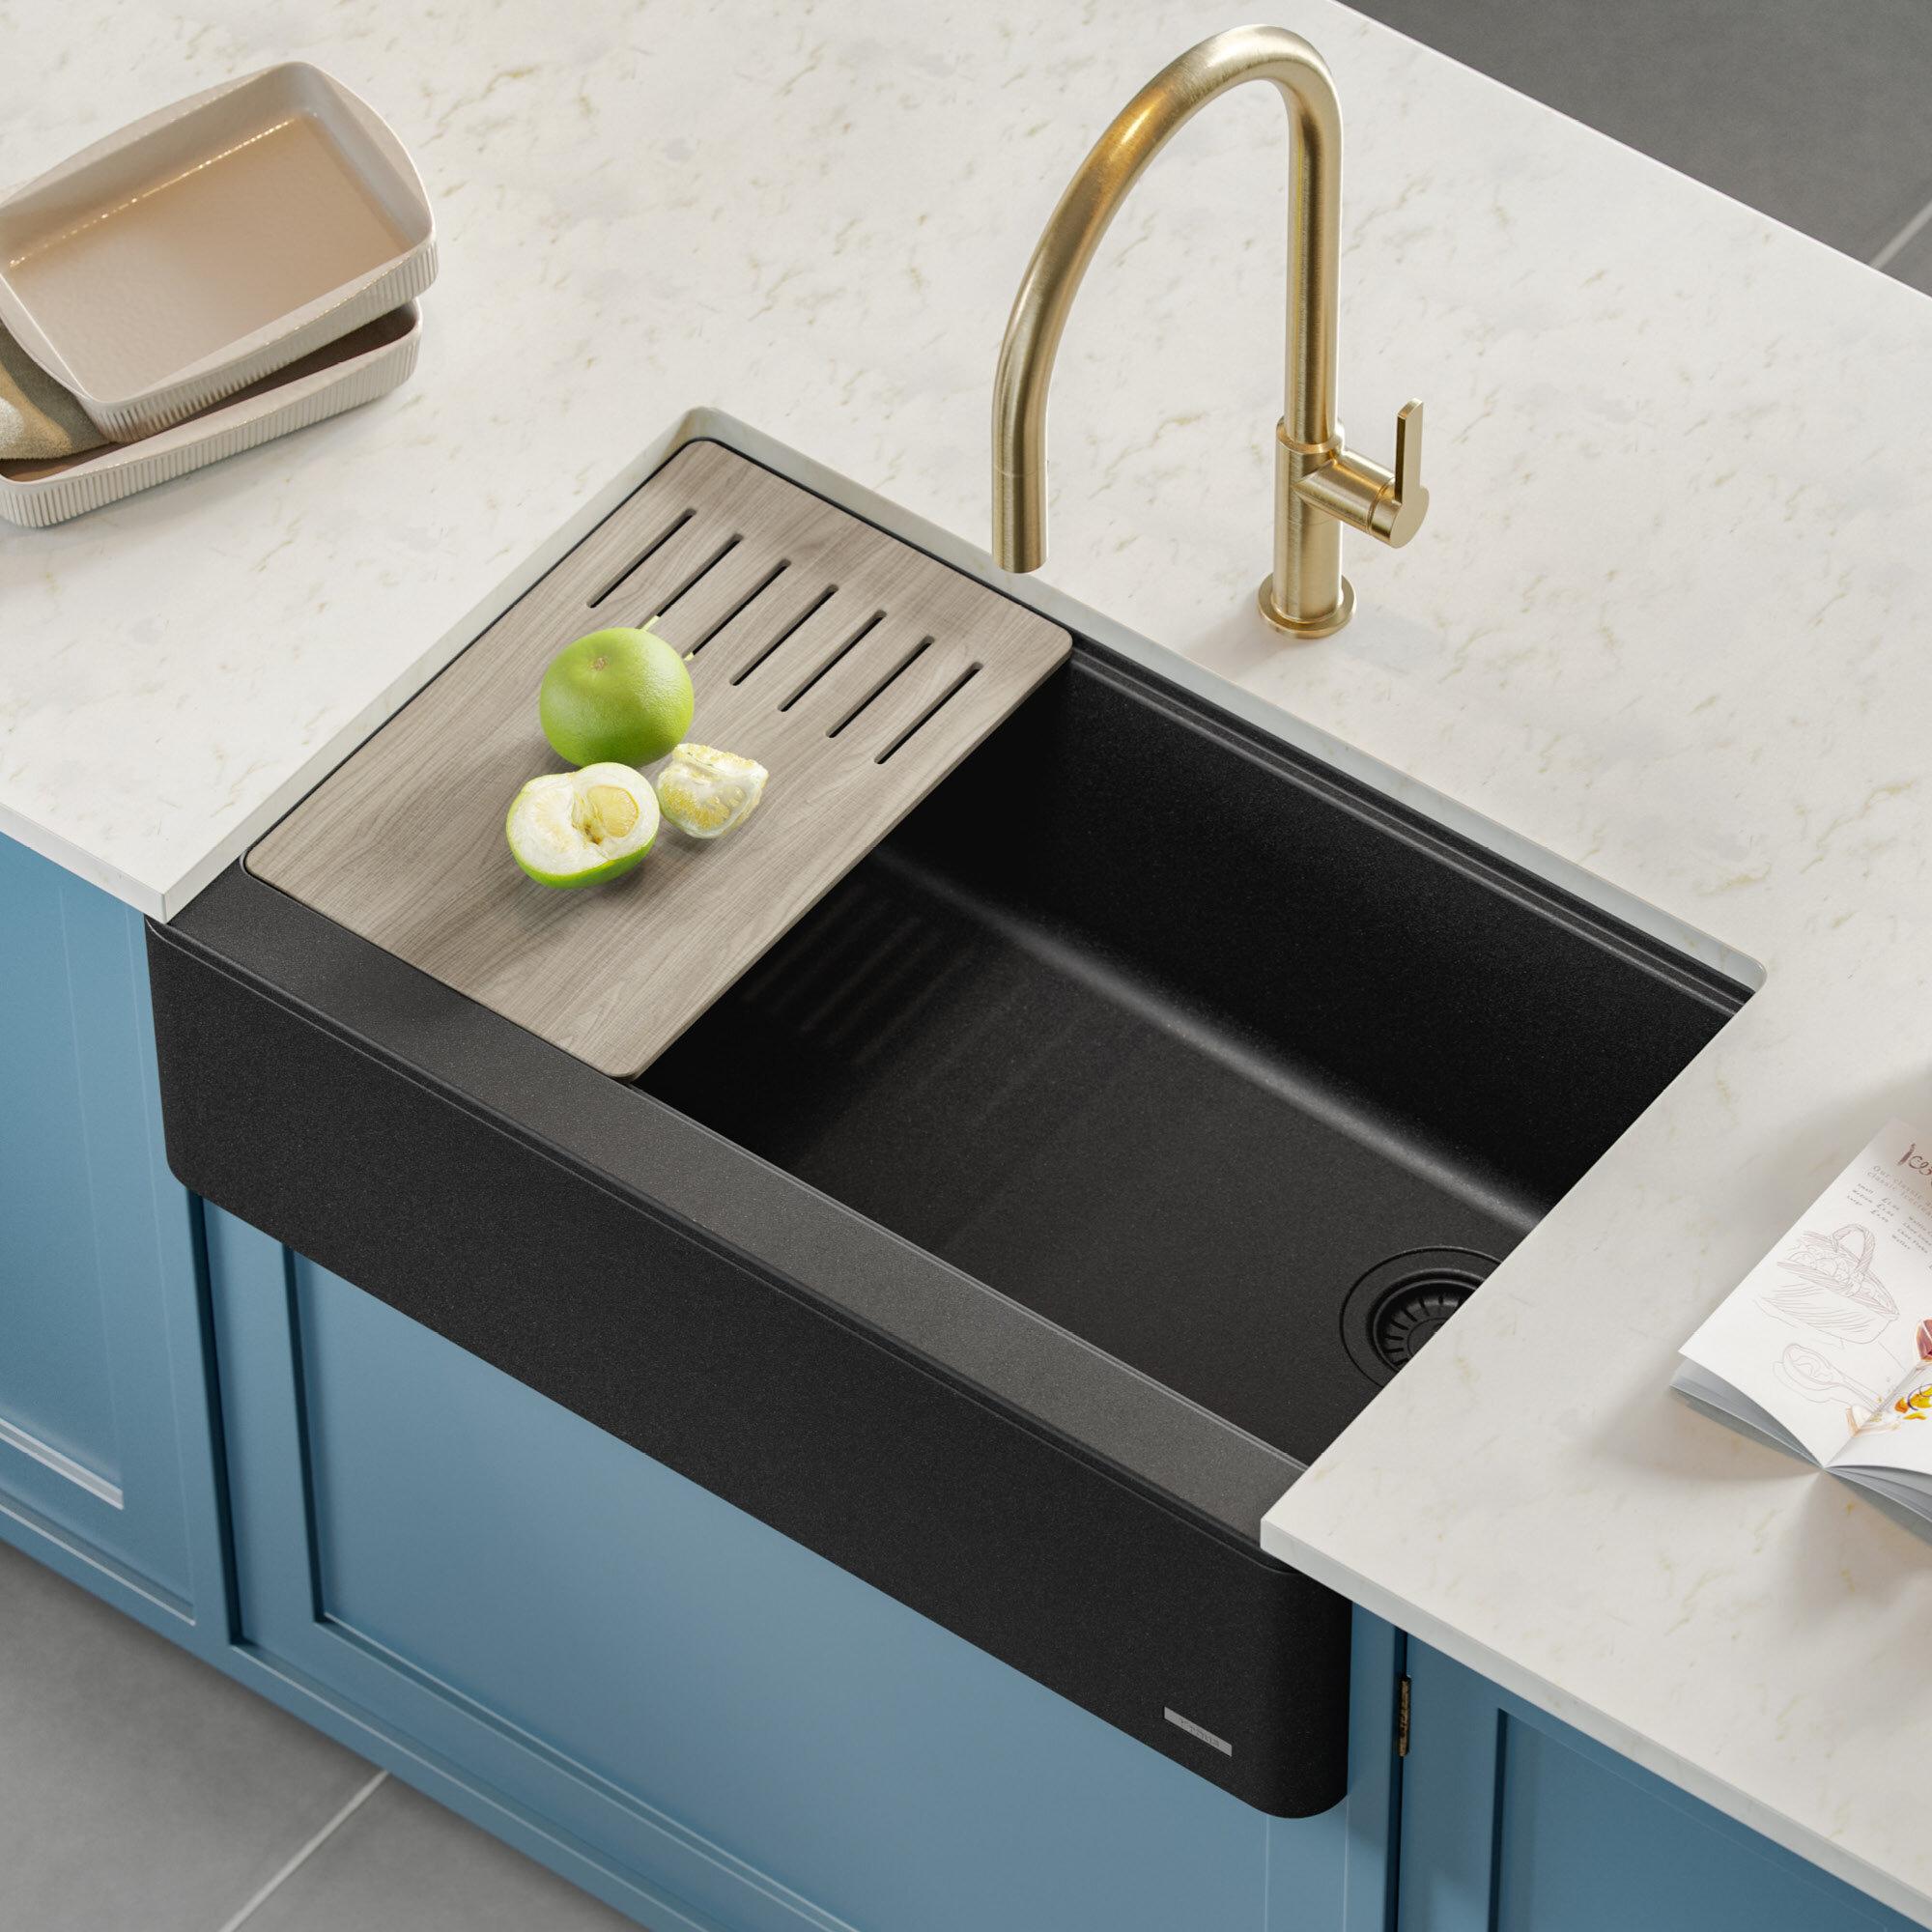 Kraus Bellucci Workstation 30 L X 21 W Farmhouse Kitchen Sink Reviews Wayfair